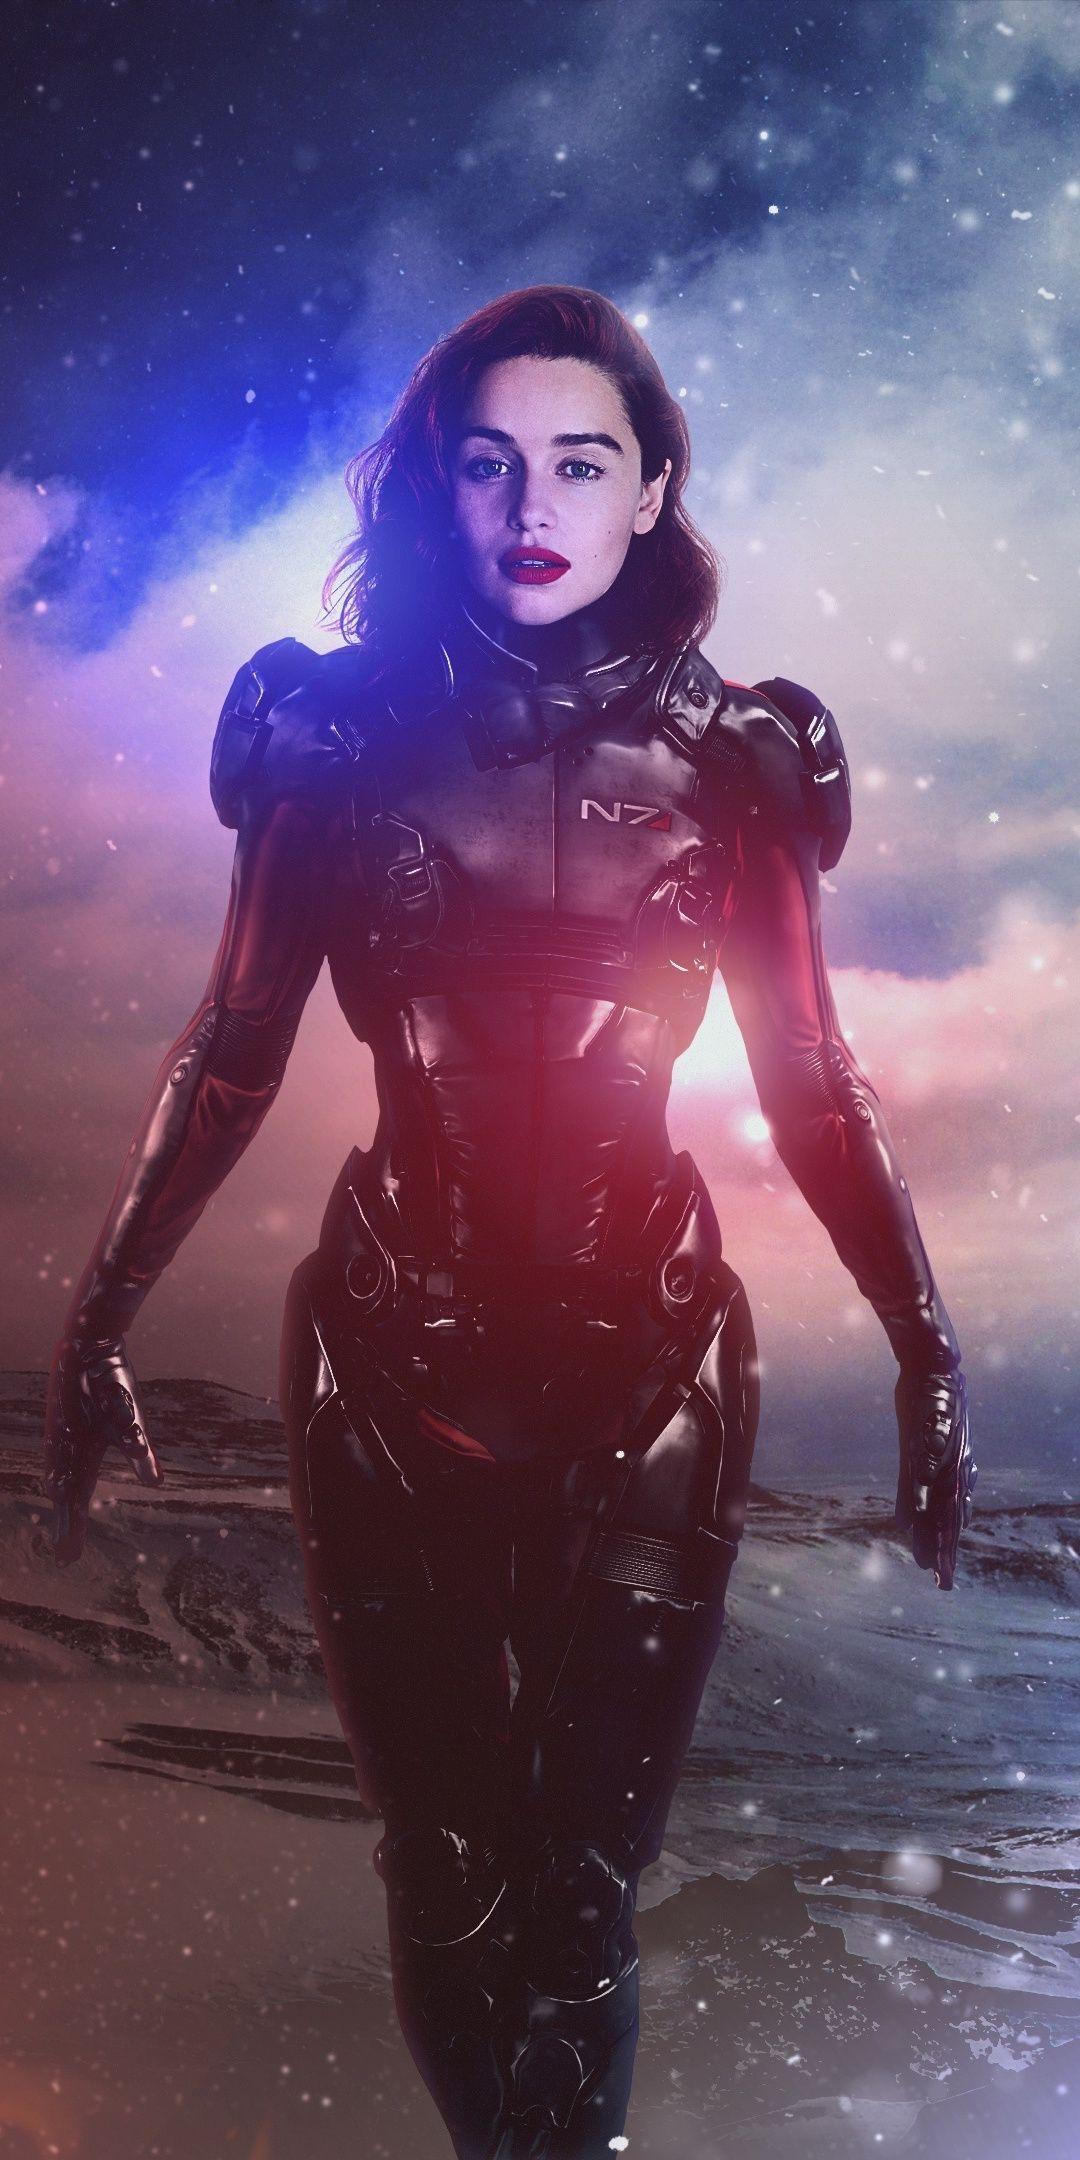 Mass Effect Andromeda Emilia Clarke Video Game Art 1080x2160 Wallpaper Mass Effect Emilia Clarke Mass